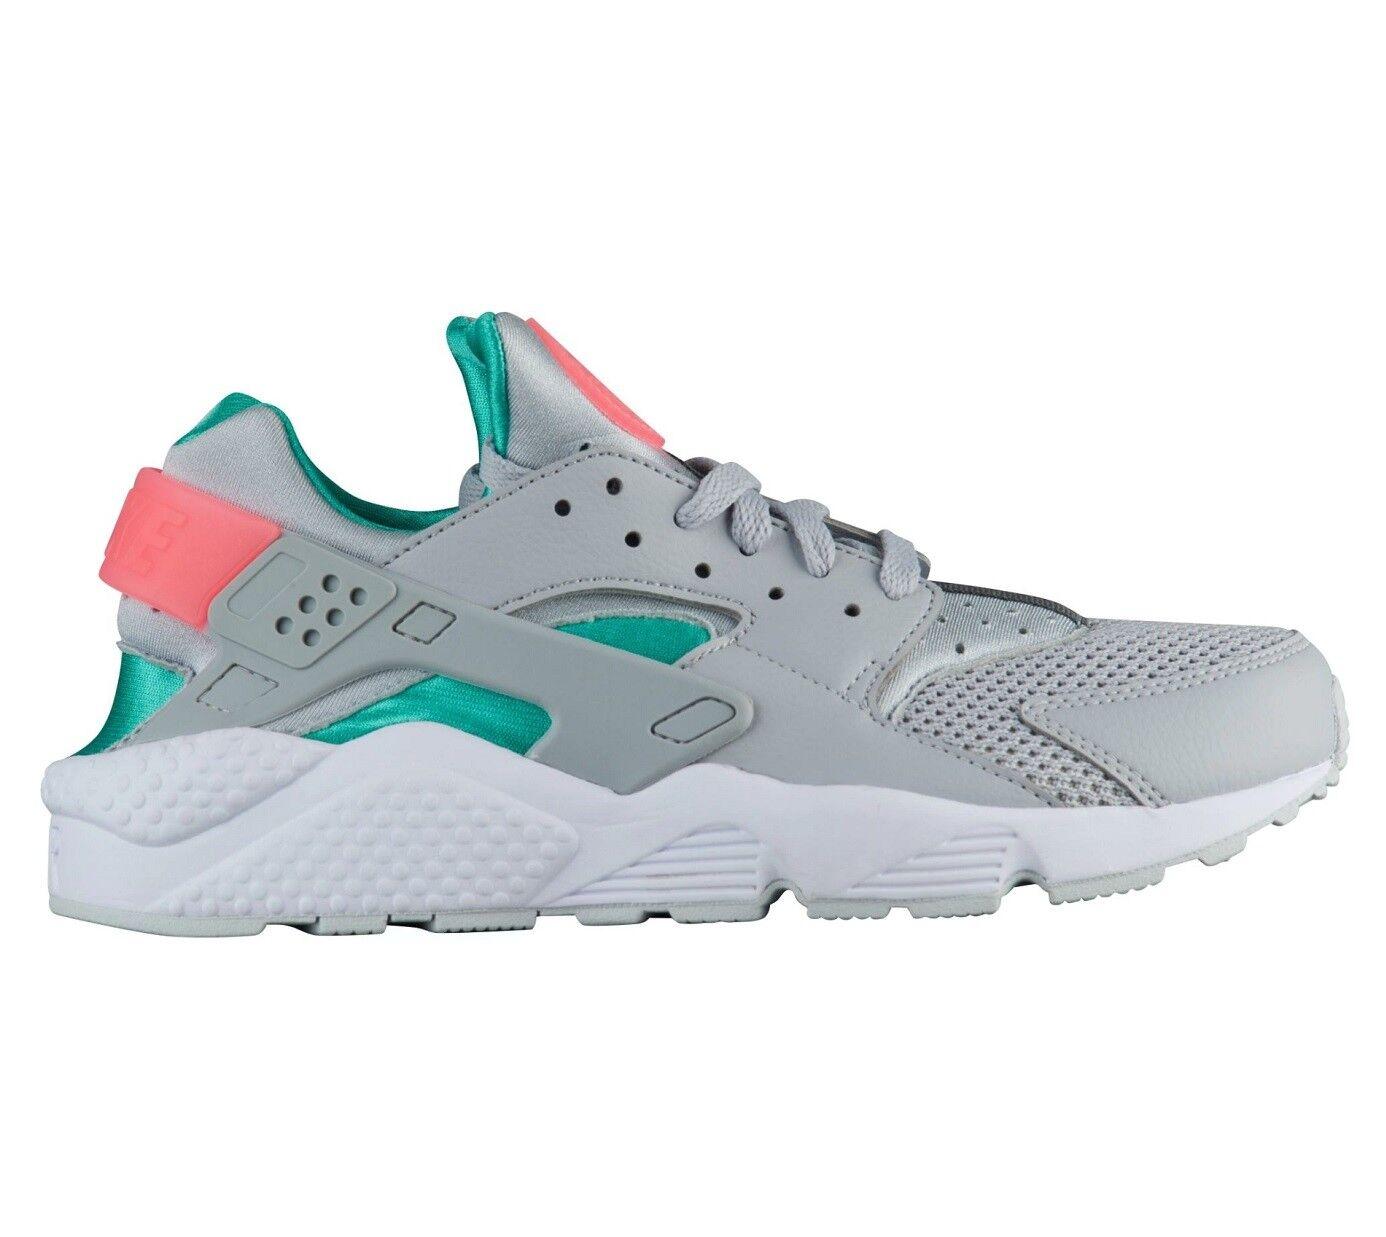 Nike air huarache south beach Uomo 318429-053 grigio - verde scarpe da corsa numero 13